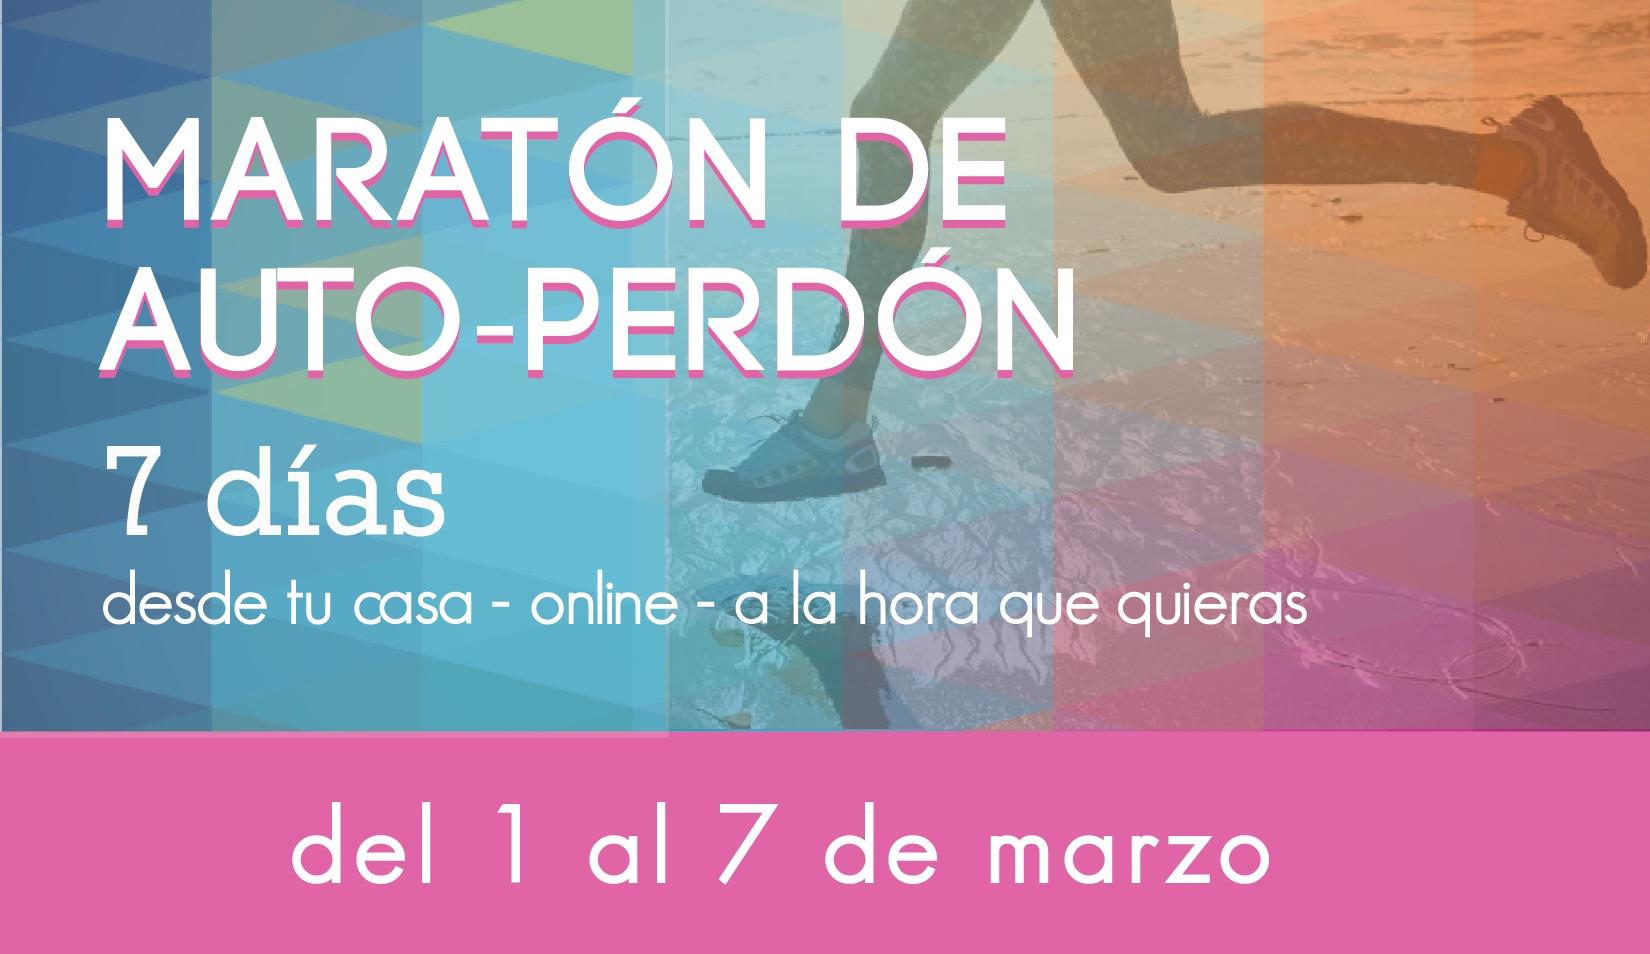 Letreritomaratonmarzo2017